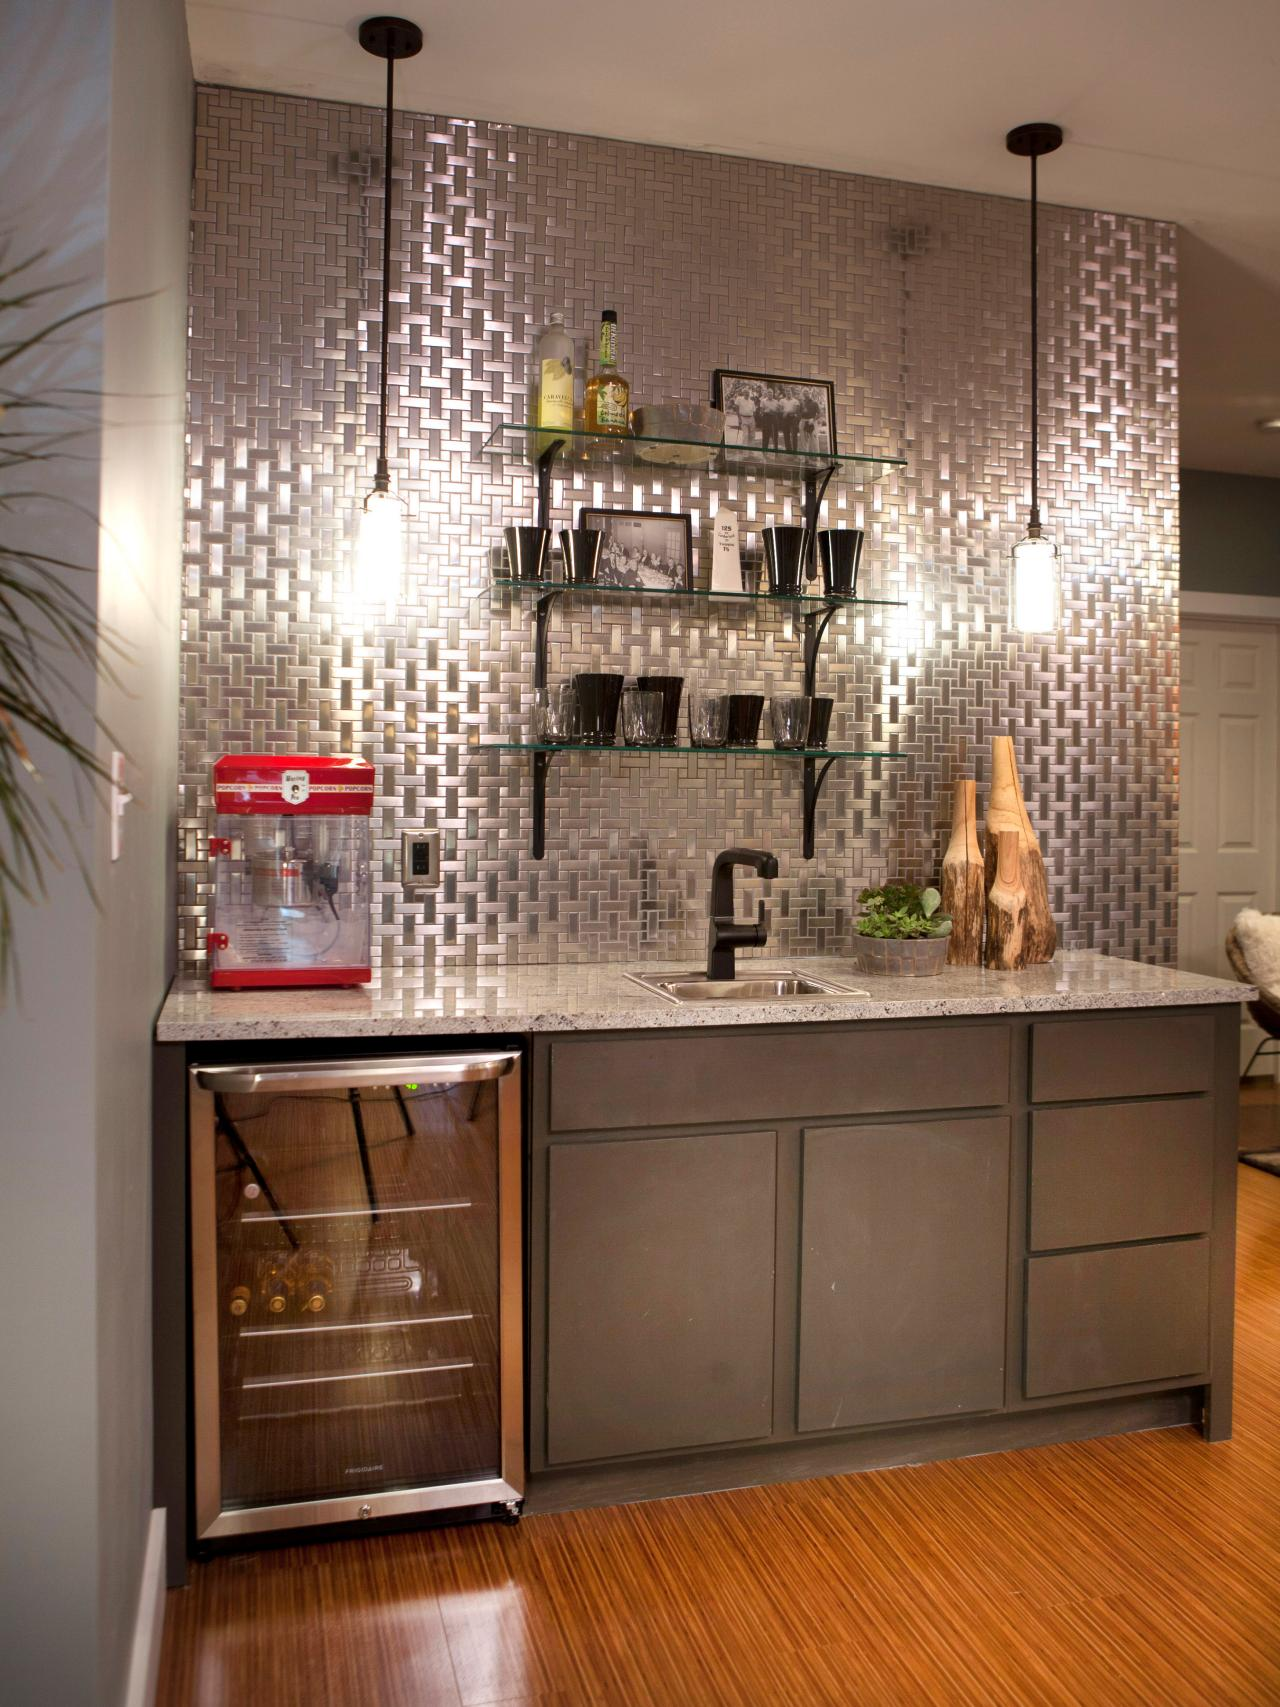 HGTV Home Bar Design Ideas for Basements